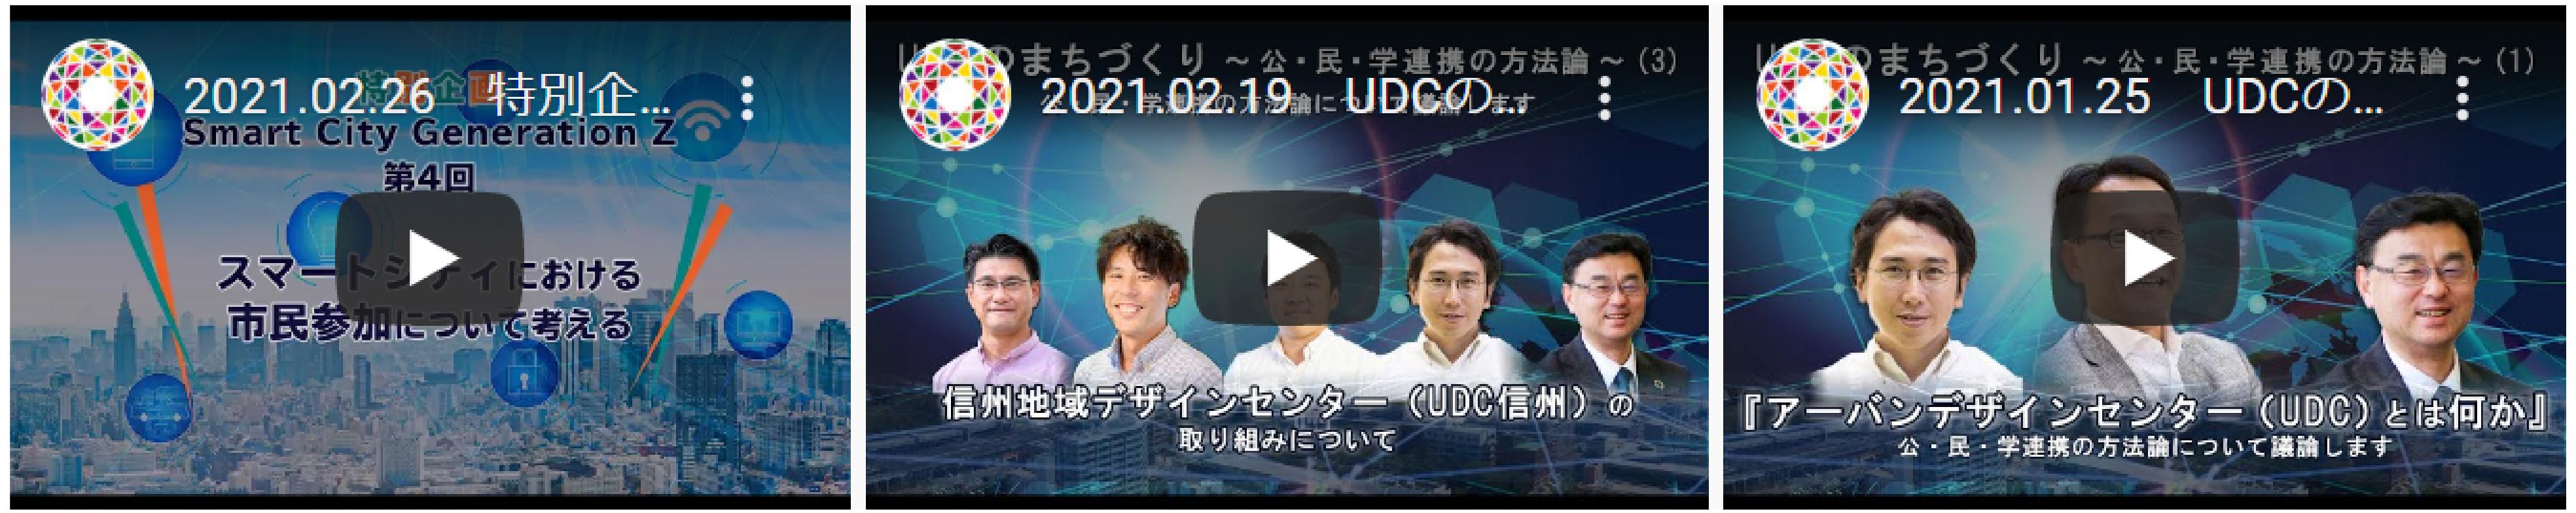 udc_news_20210315